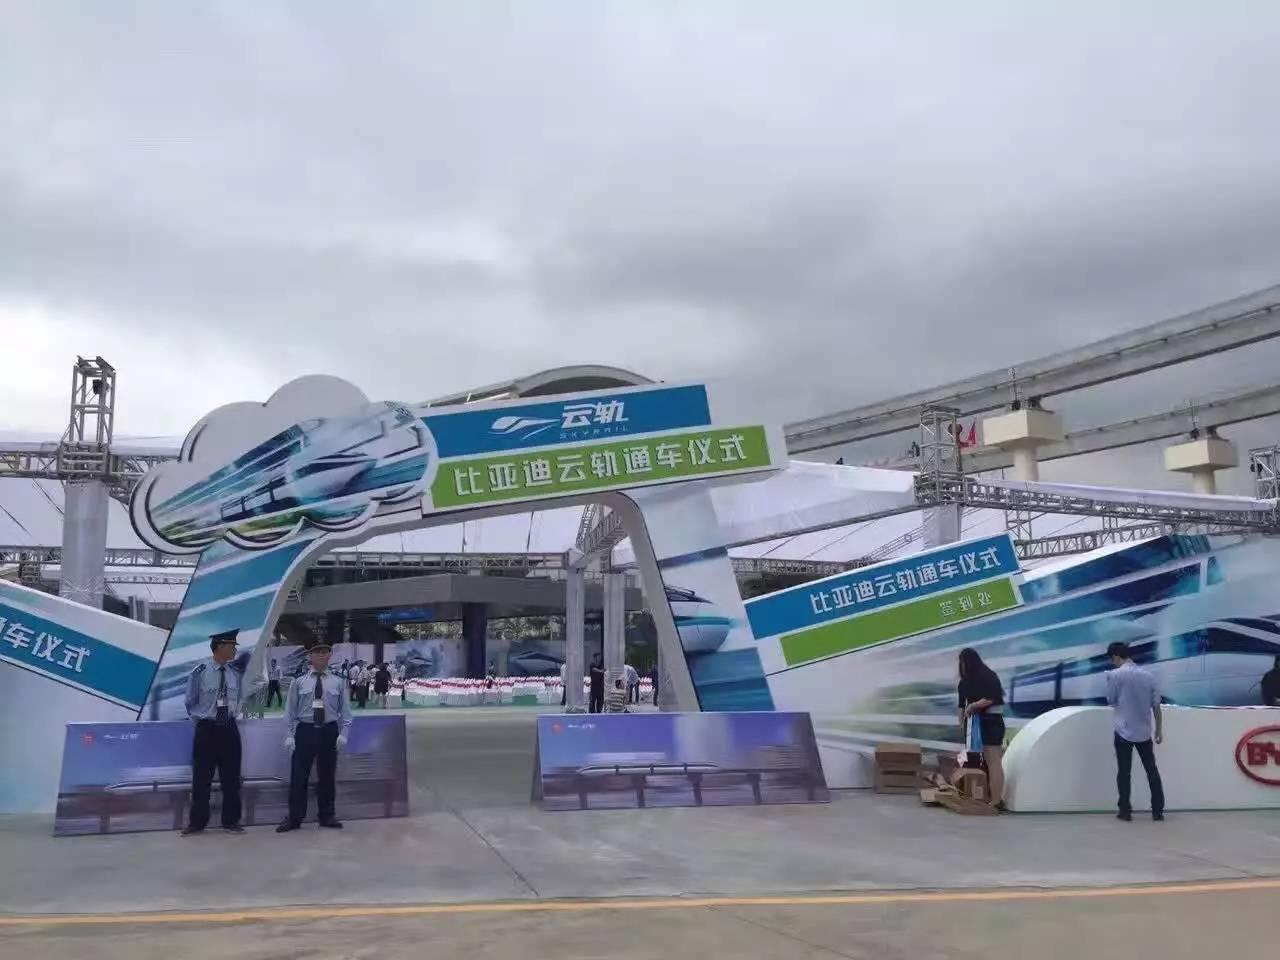 В Шэньчжэне начала работу надземная железная дорога